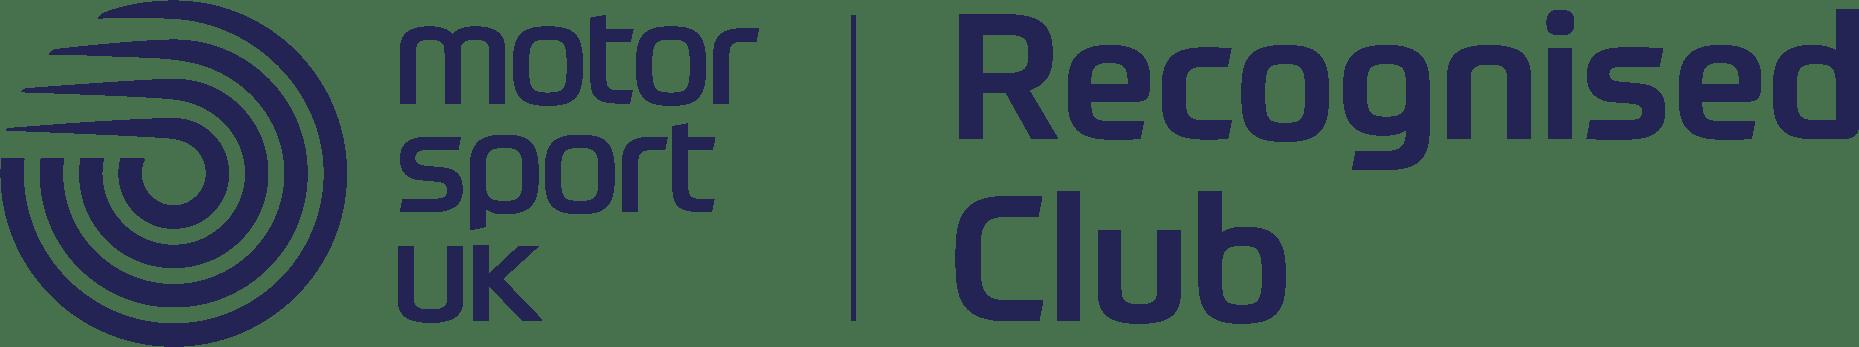 Motorsport UK Accreditation_Recognised Club_RGB